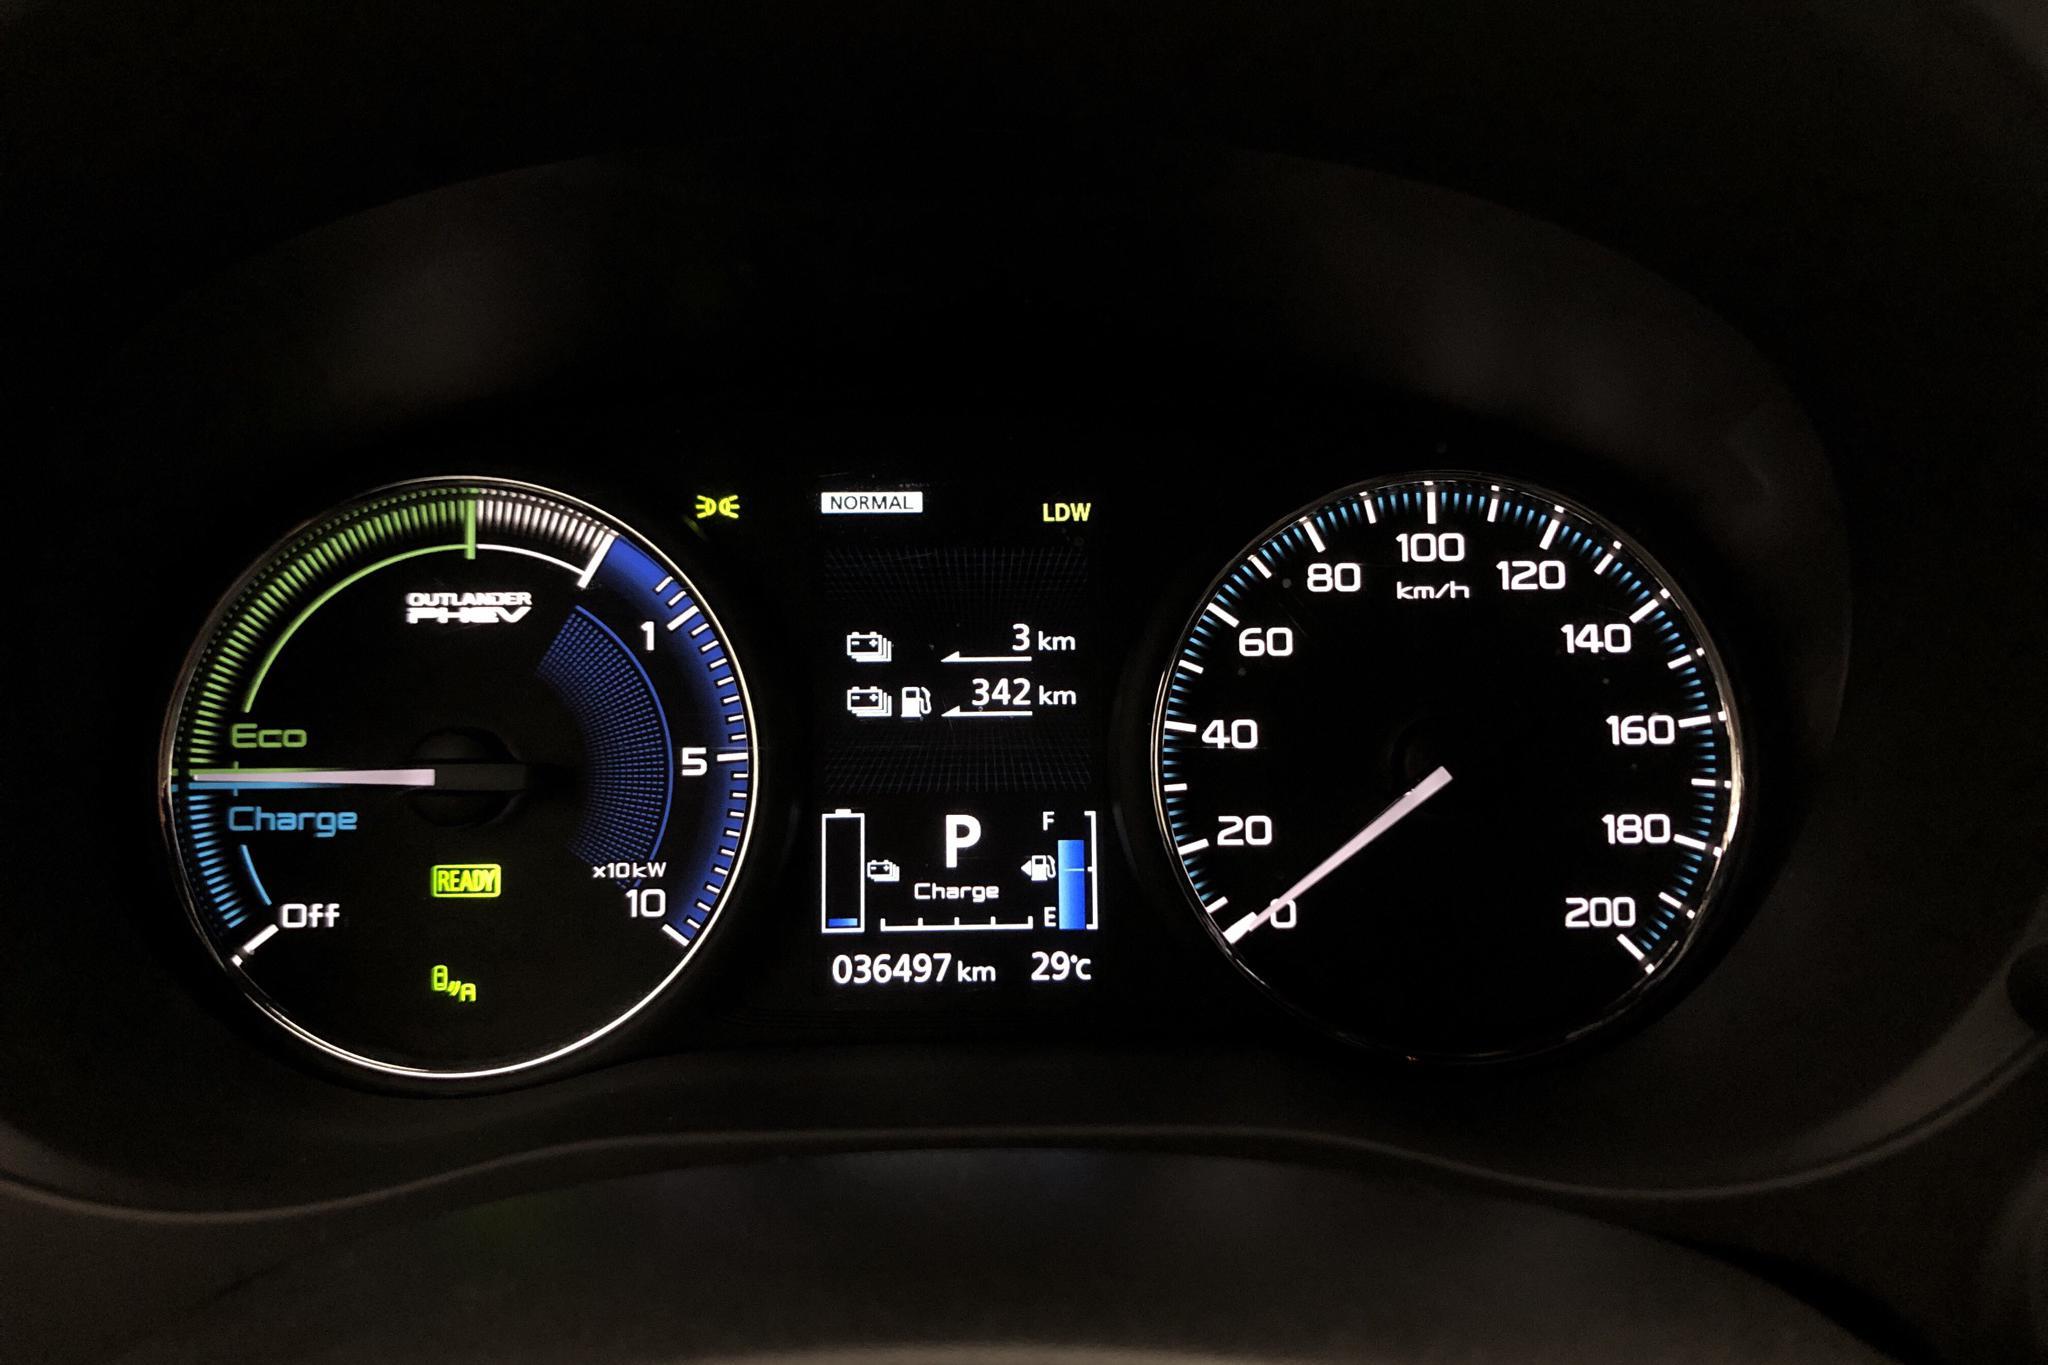 Mitsubishi Outlander 2.4 Plug-in Hybrid 4WD (136hk) - 36 490 km - Automatic - white - 2019